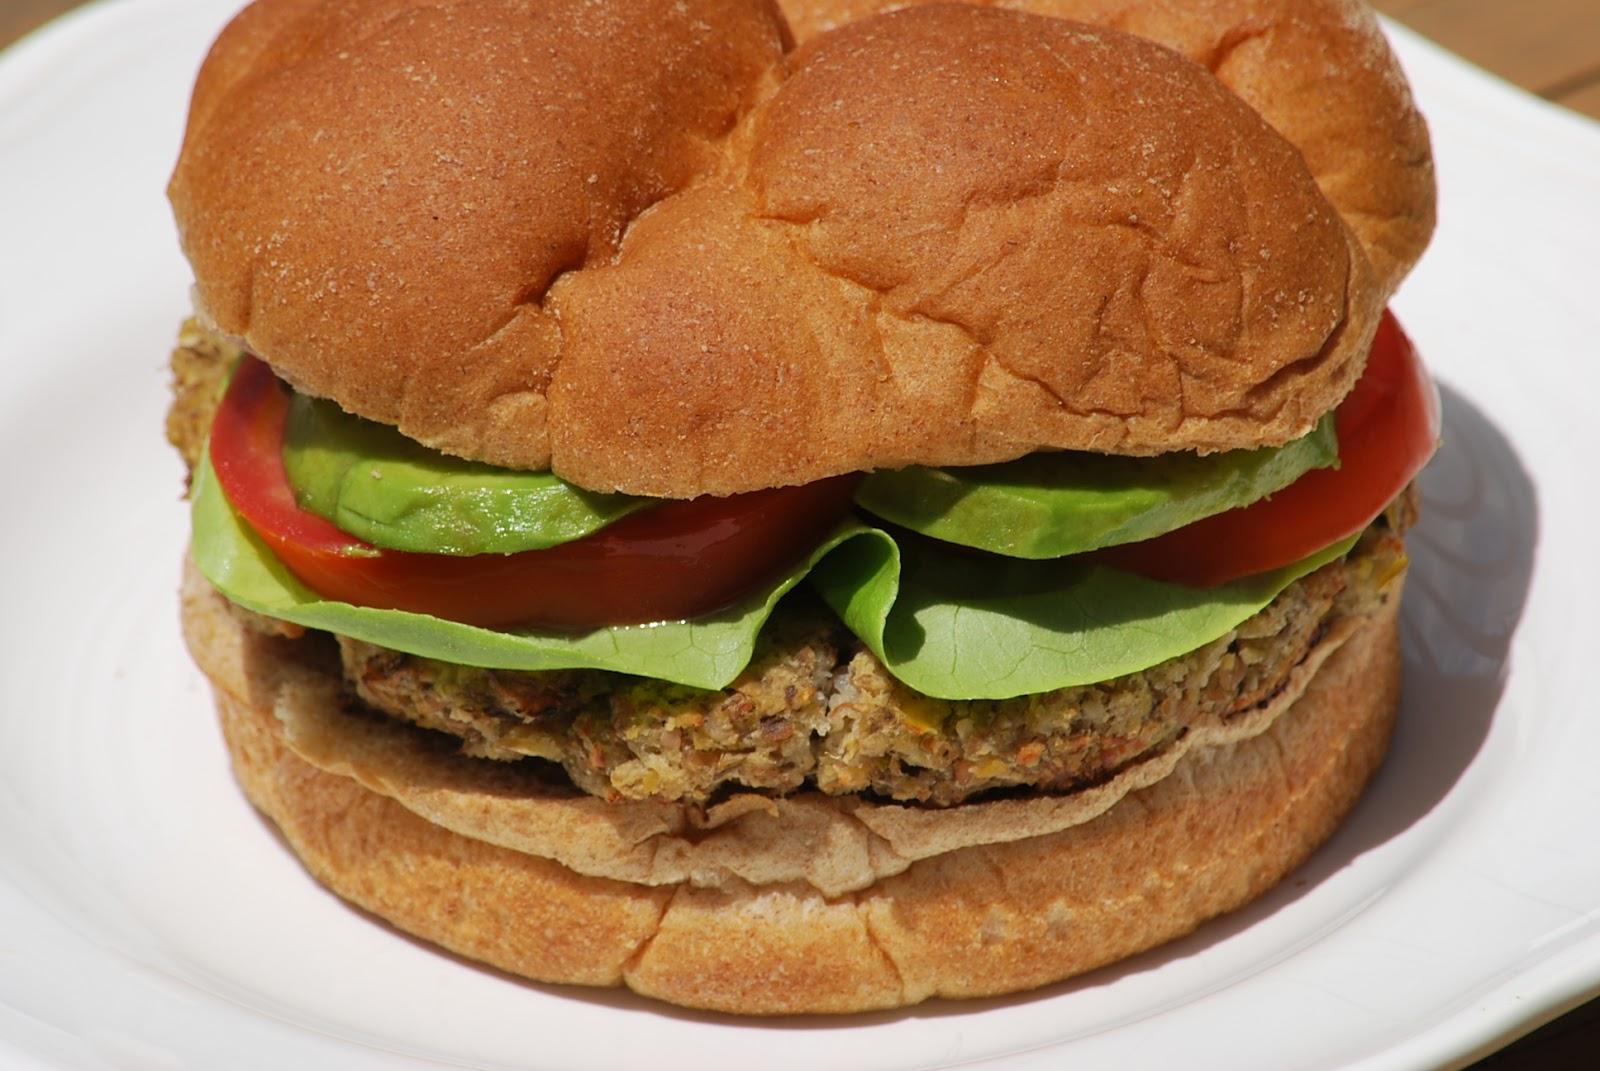 vegetarian burger edamame burger taco burger balkan burger best burger ...